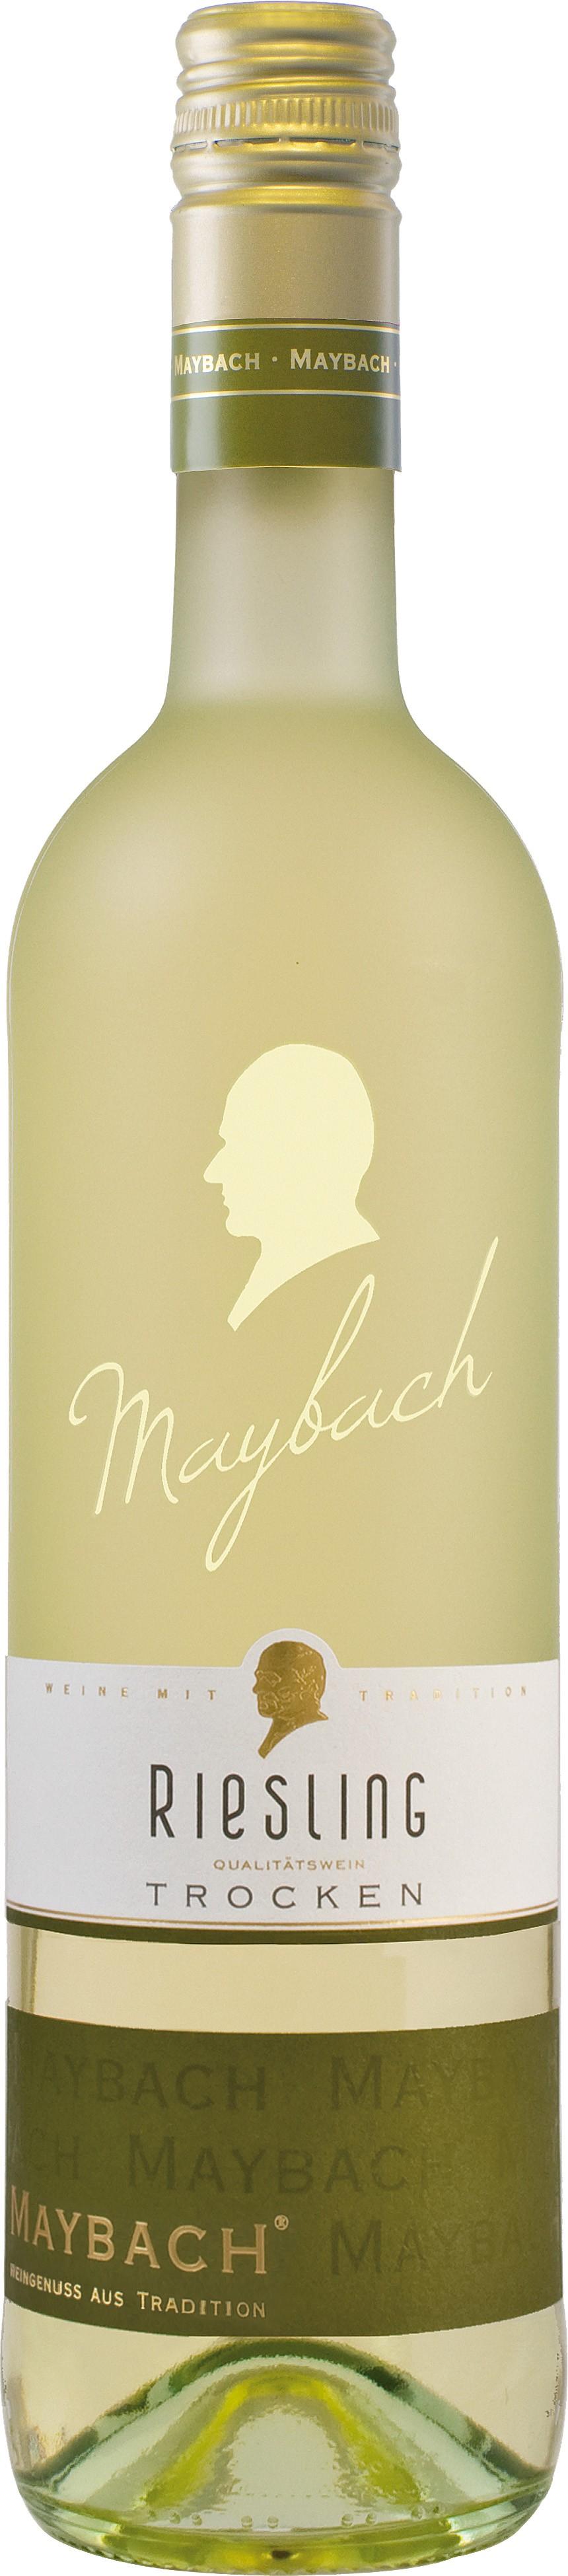 maybach riesling qba trocken 0.75 l